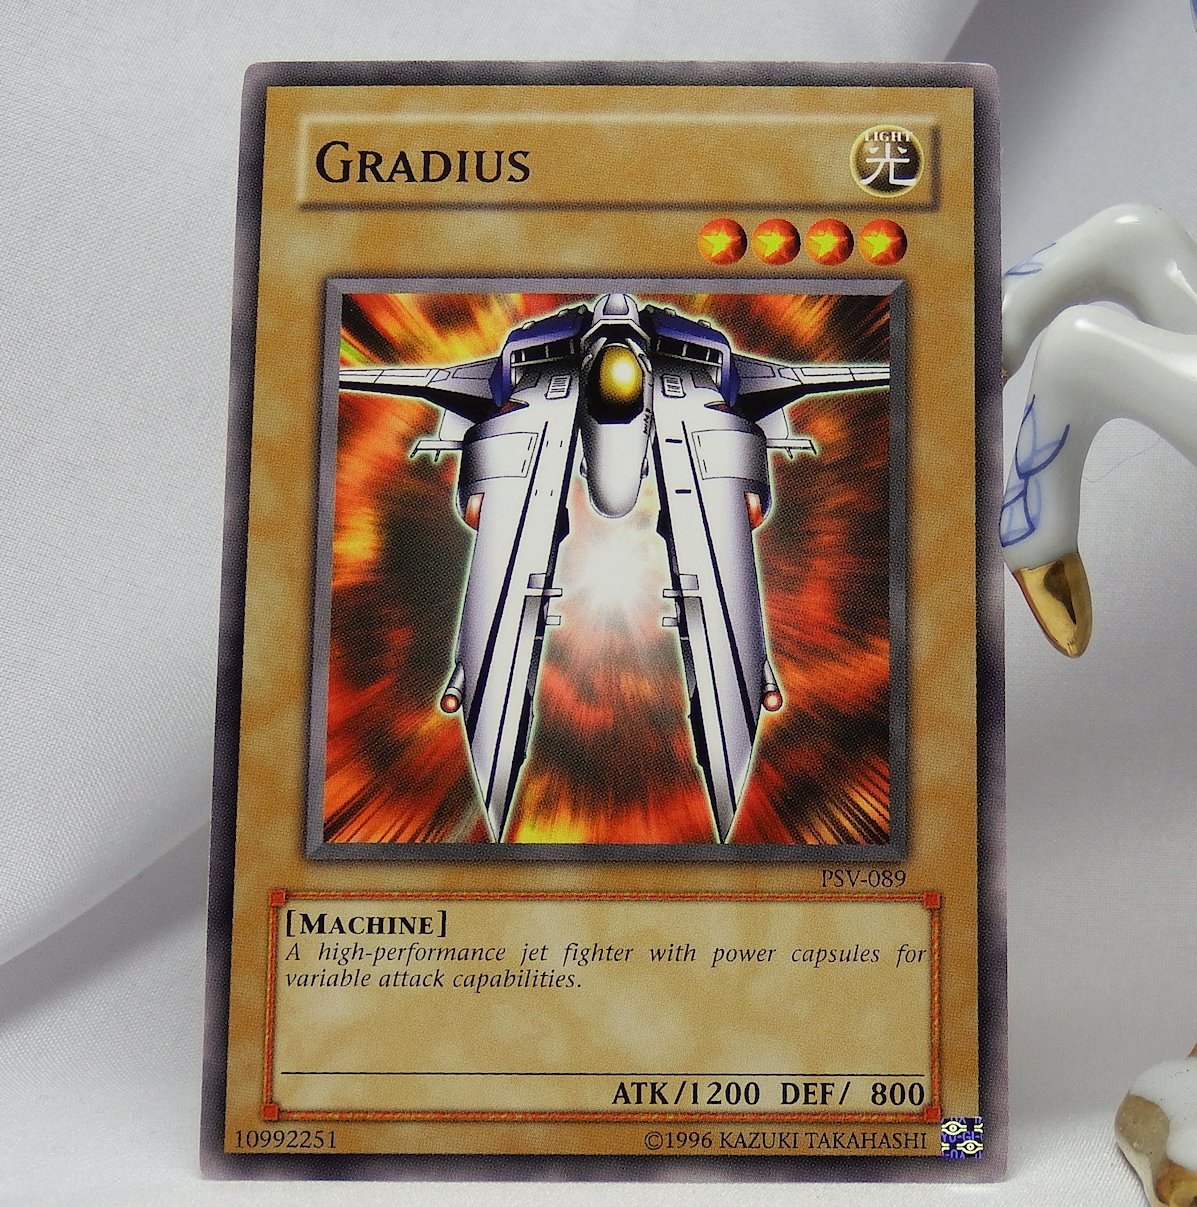 YuGiOh Pharaoh's Servant PSV-089 Gradius